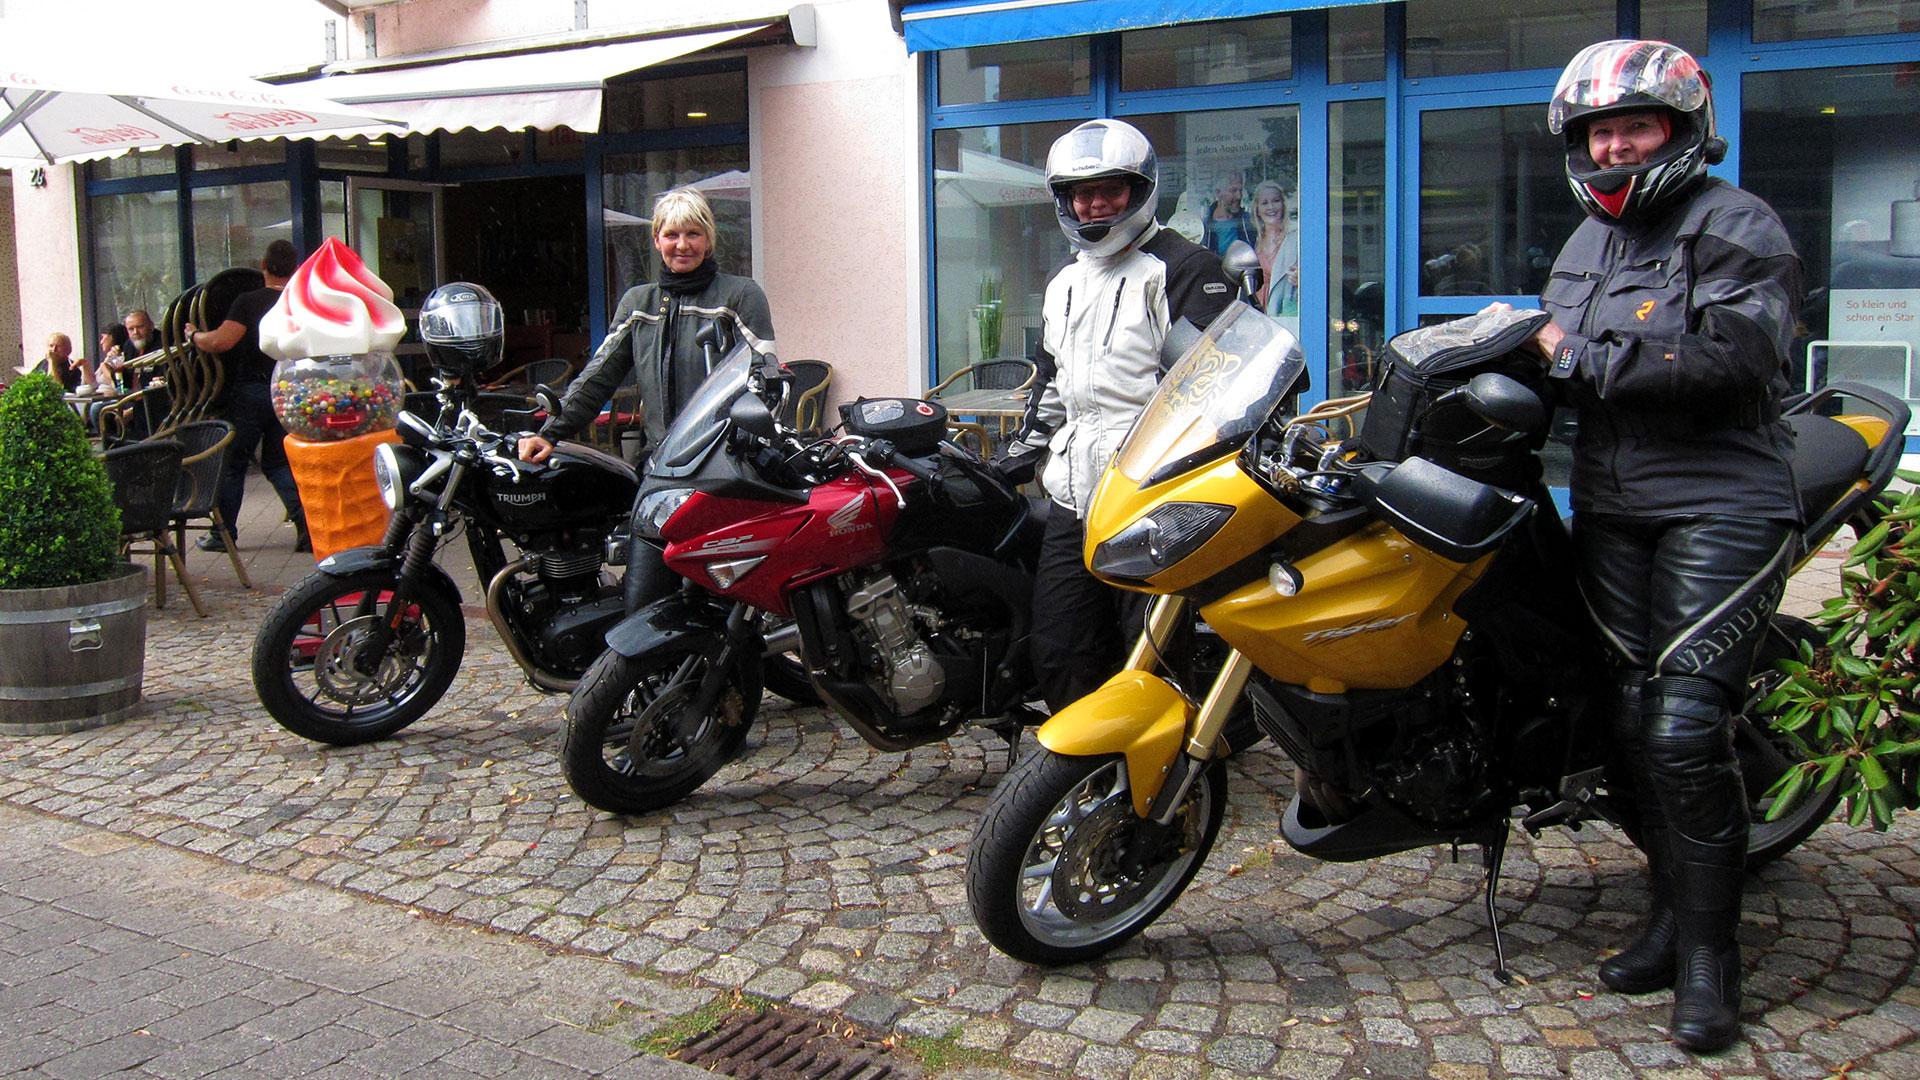 bikerladys01_1920x1080